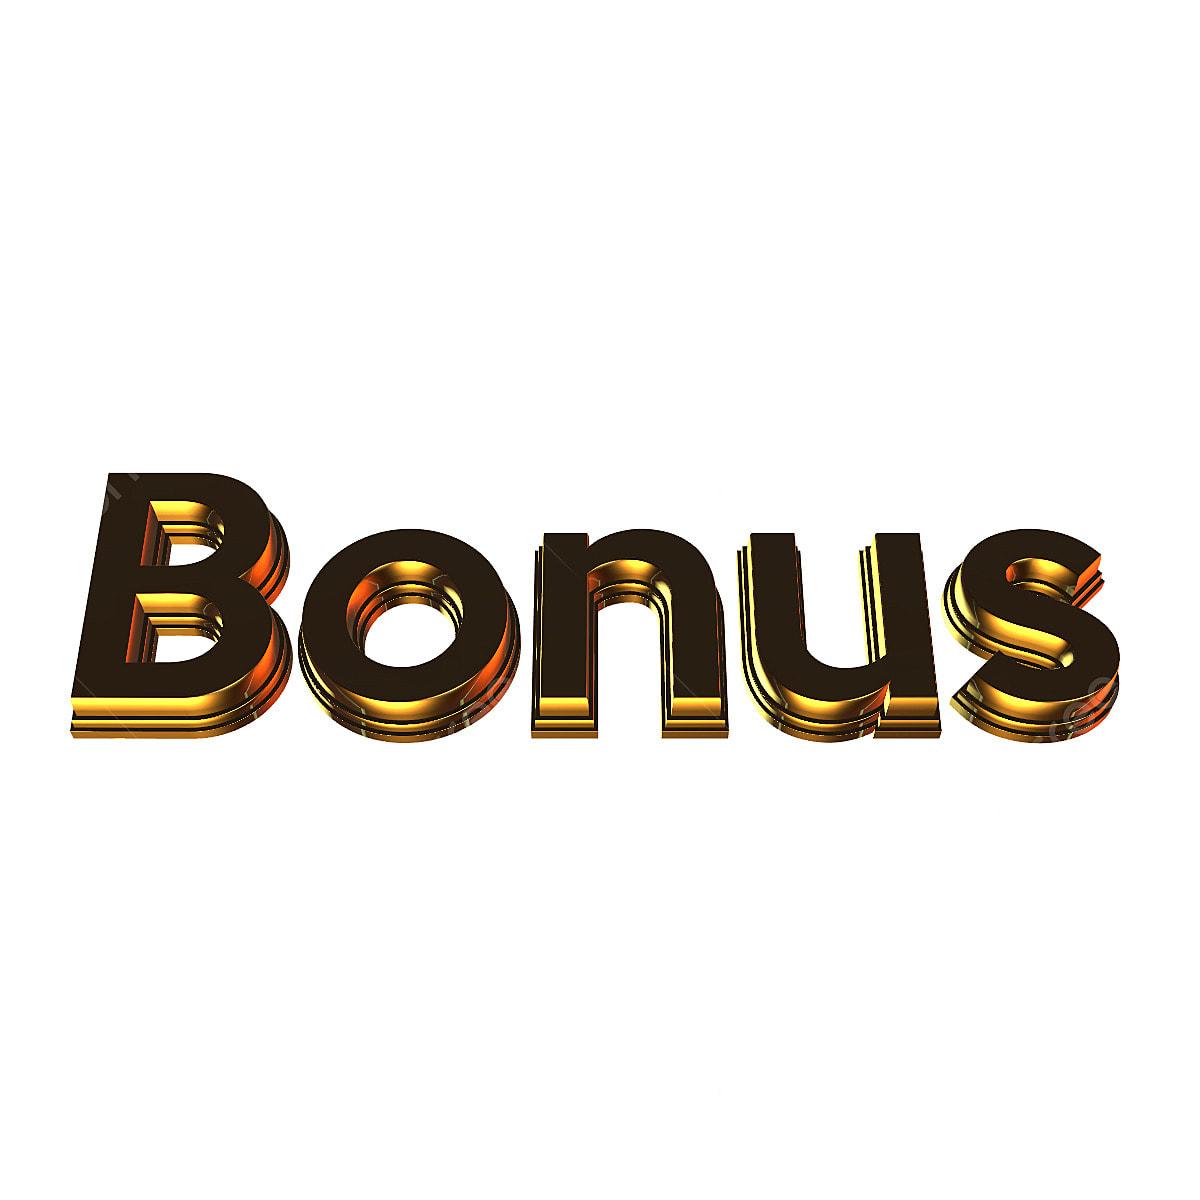 3d Bonus Gold Text Font Effect Psd For Free Download